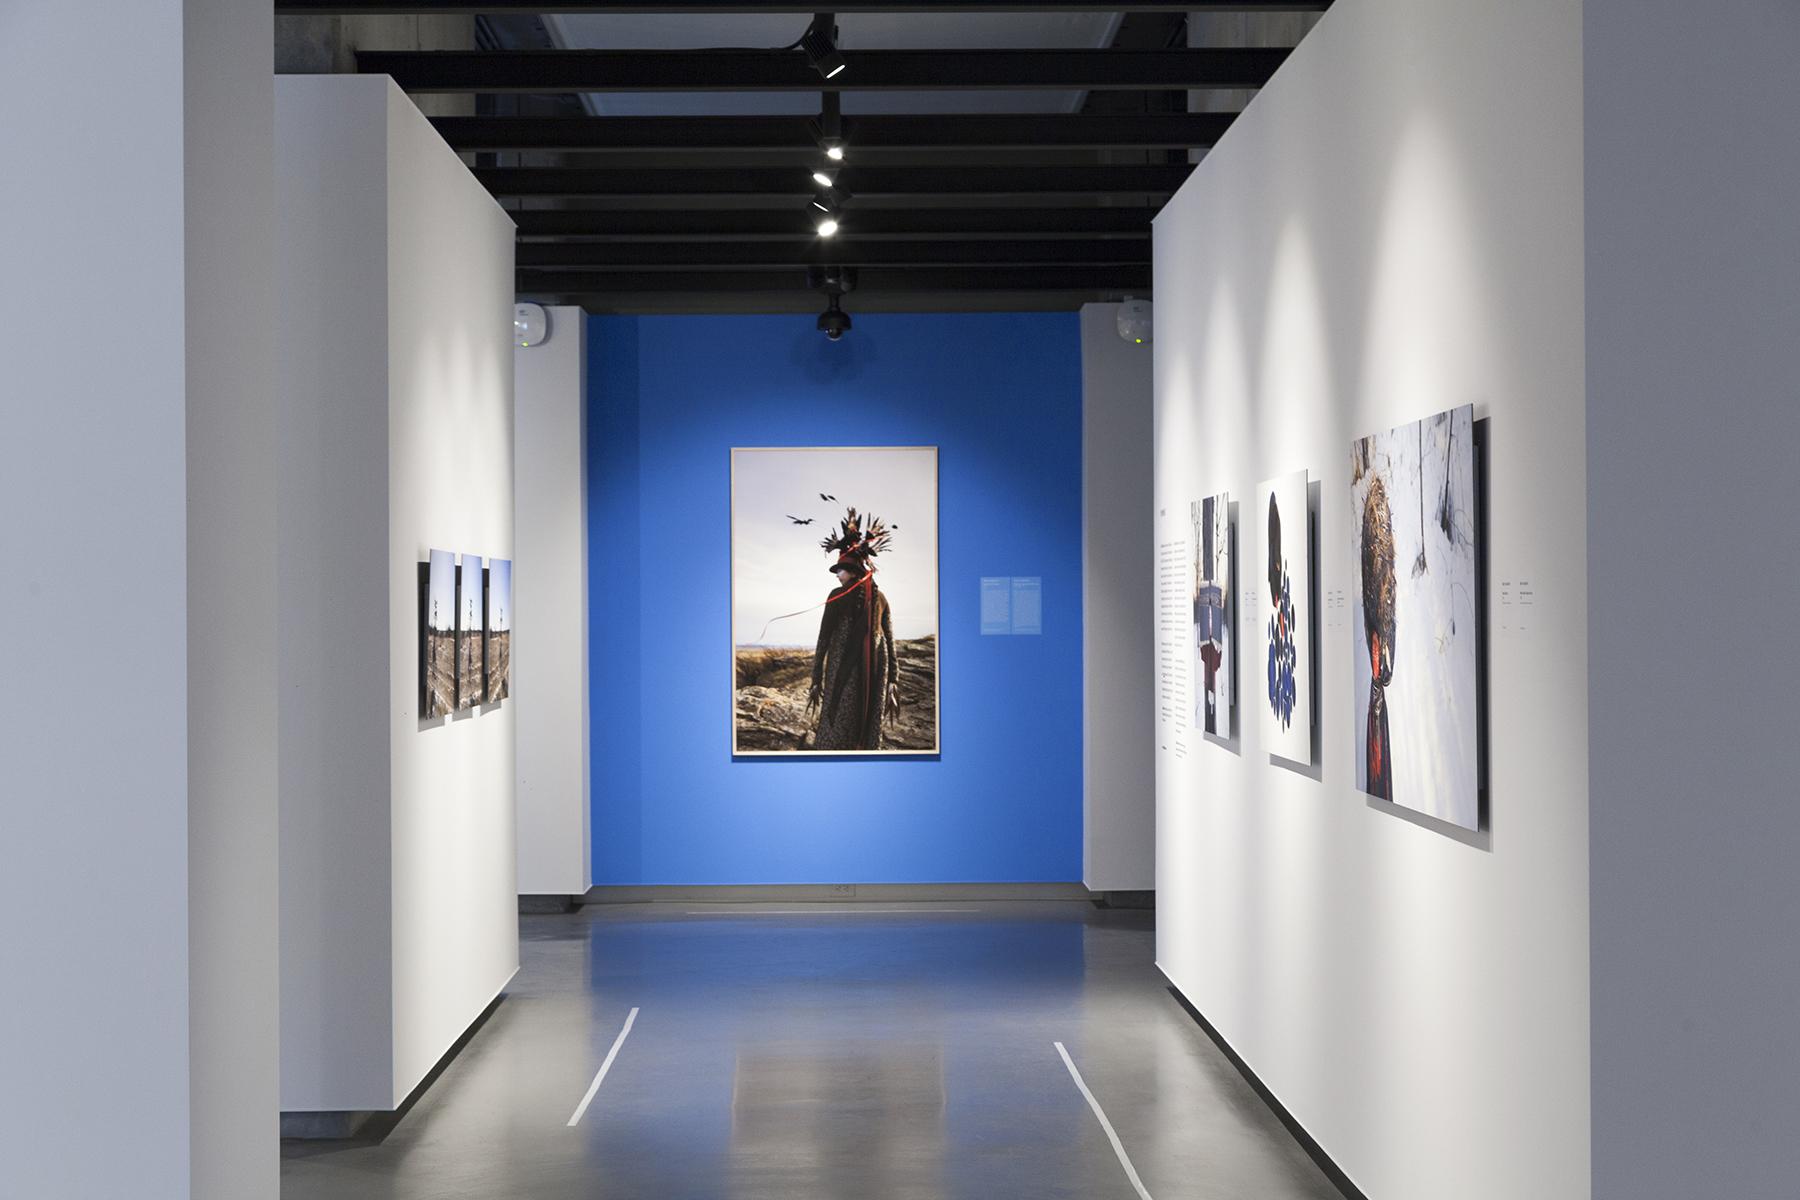 Meryl McMaster, New Generation Photography Award, Exhibition at On Site Gallery, May - June 2018. Photo by Yuula Benivolski